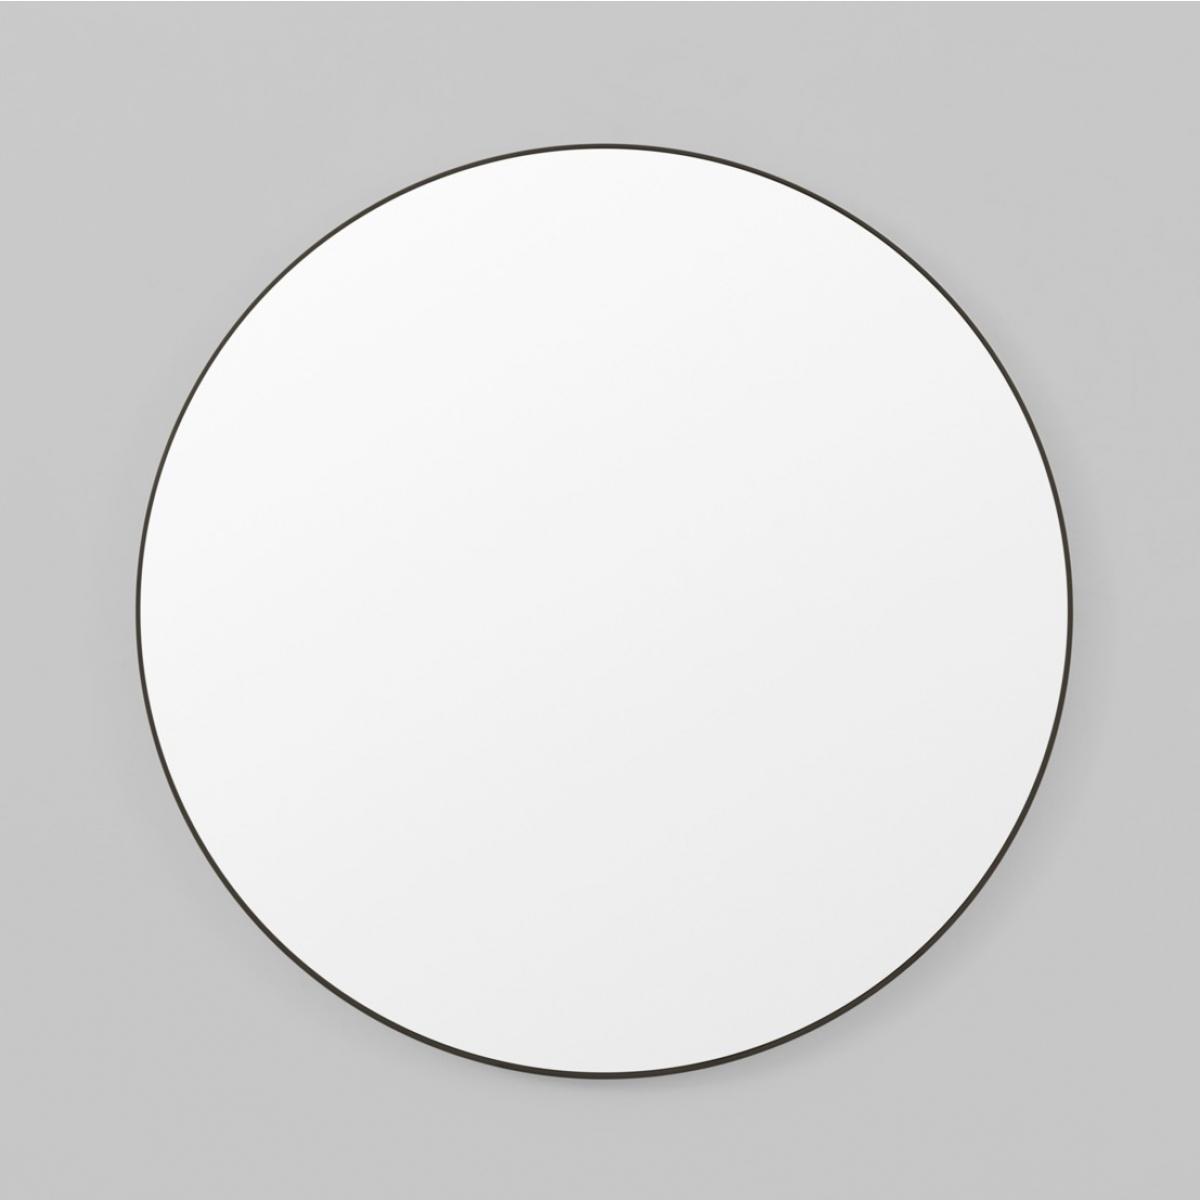 Middle Of Nowhere Flynn Round Mirror Black - 3 Sizes regarding Round Black Mirrors (Image 16 of 25)